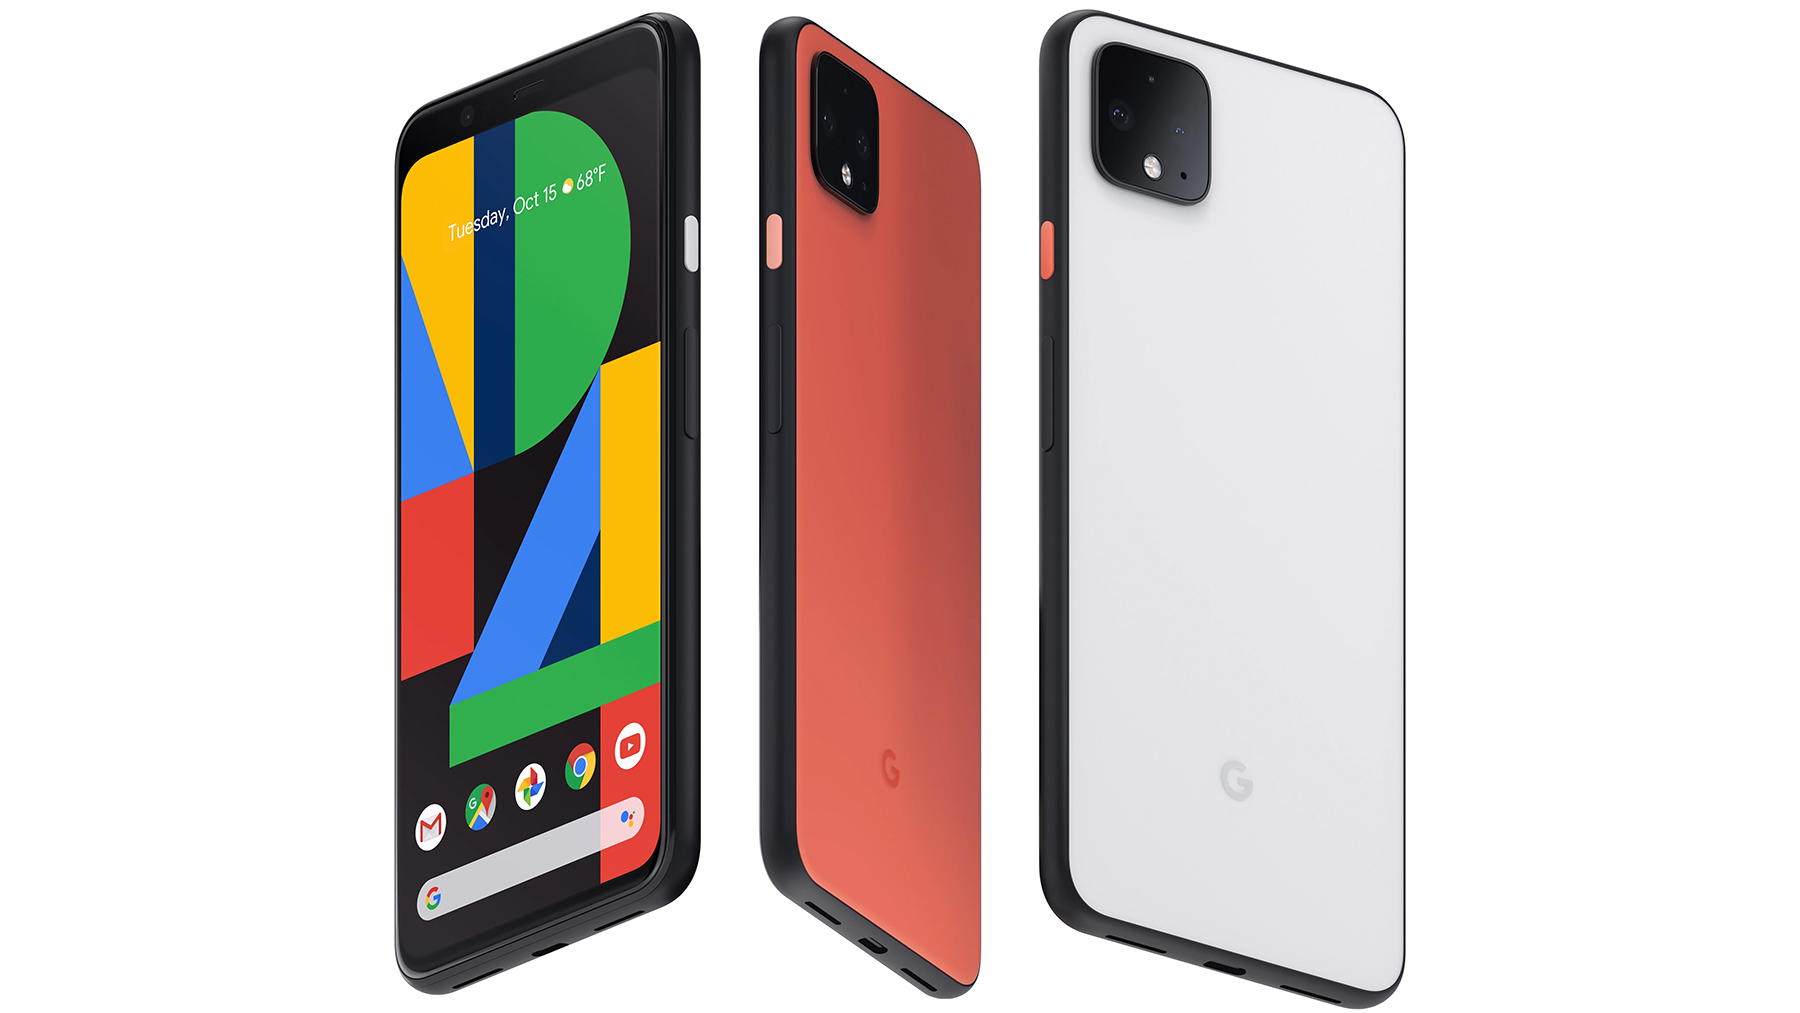 Google reveals Pixel 4 flagship phones, with best cameras yet